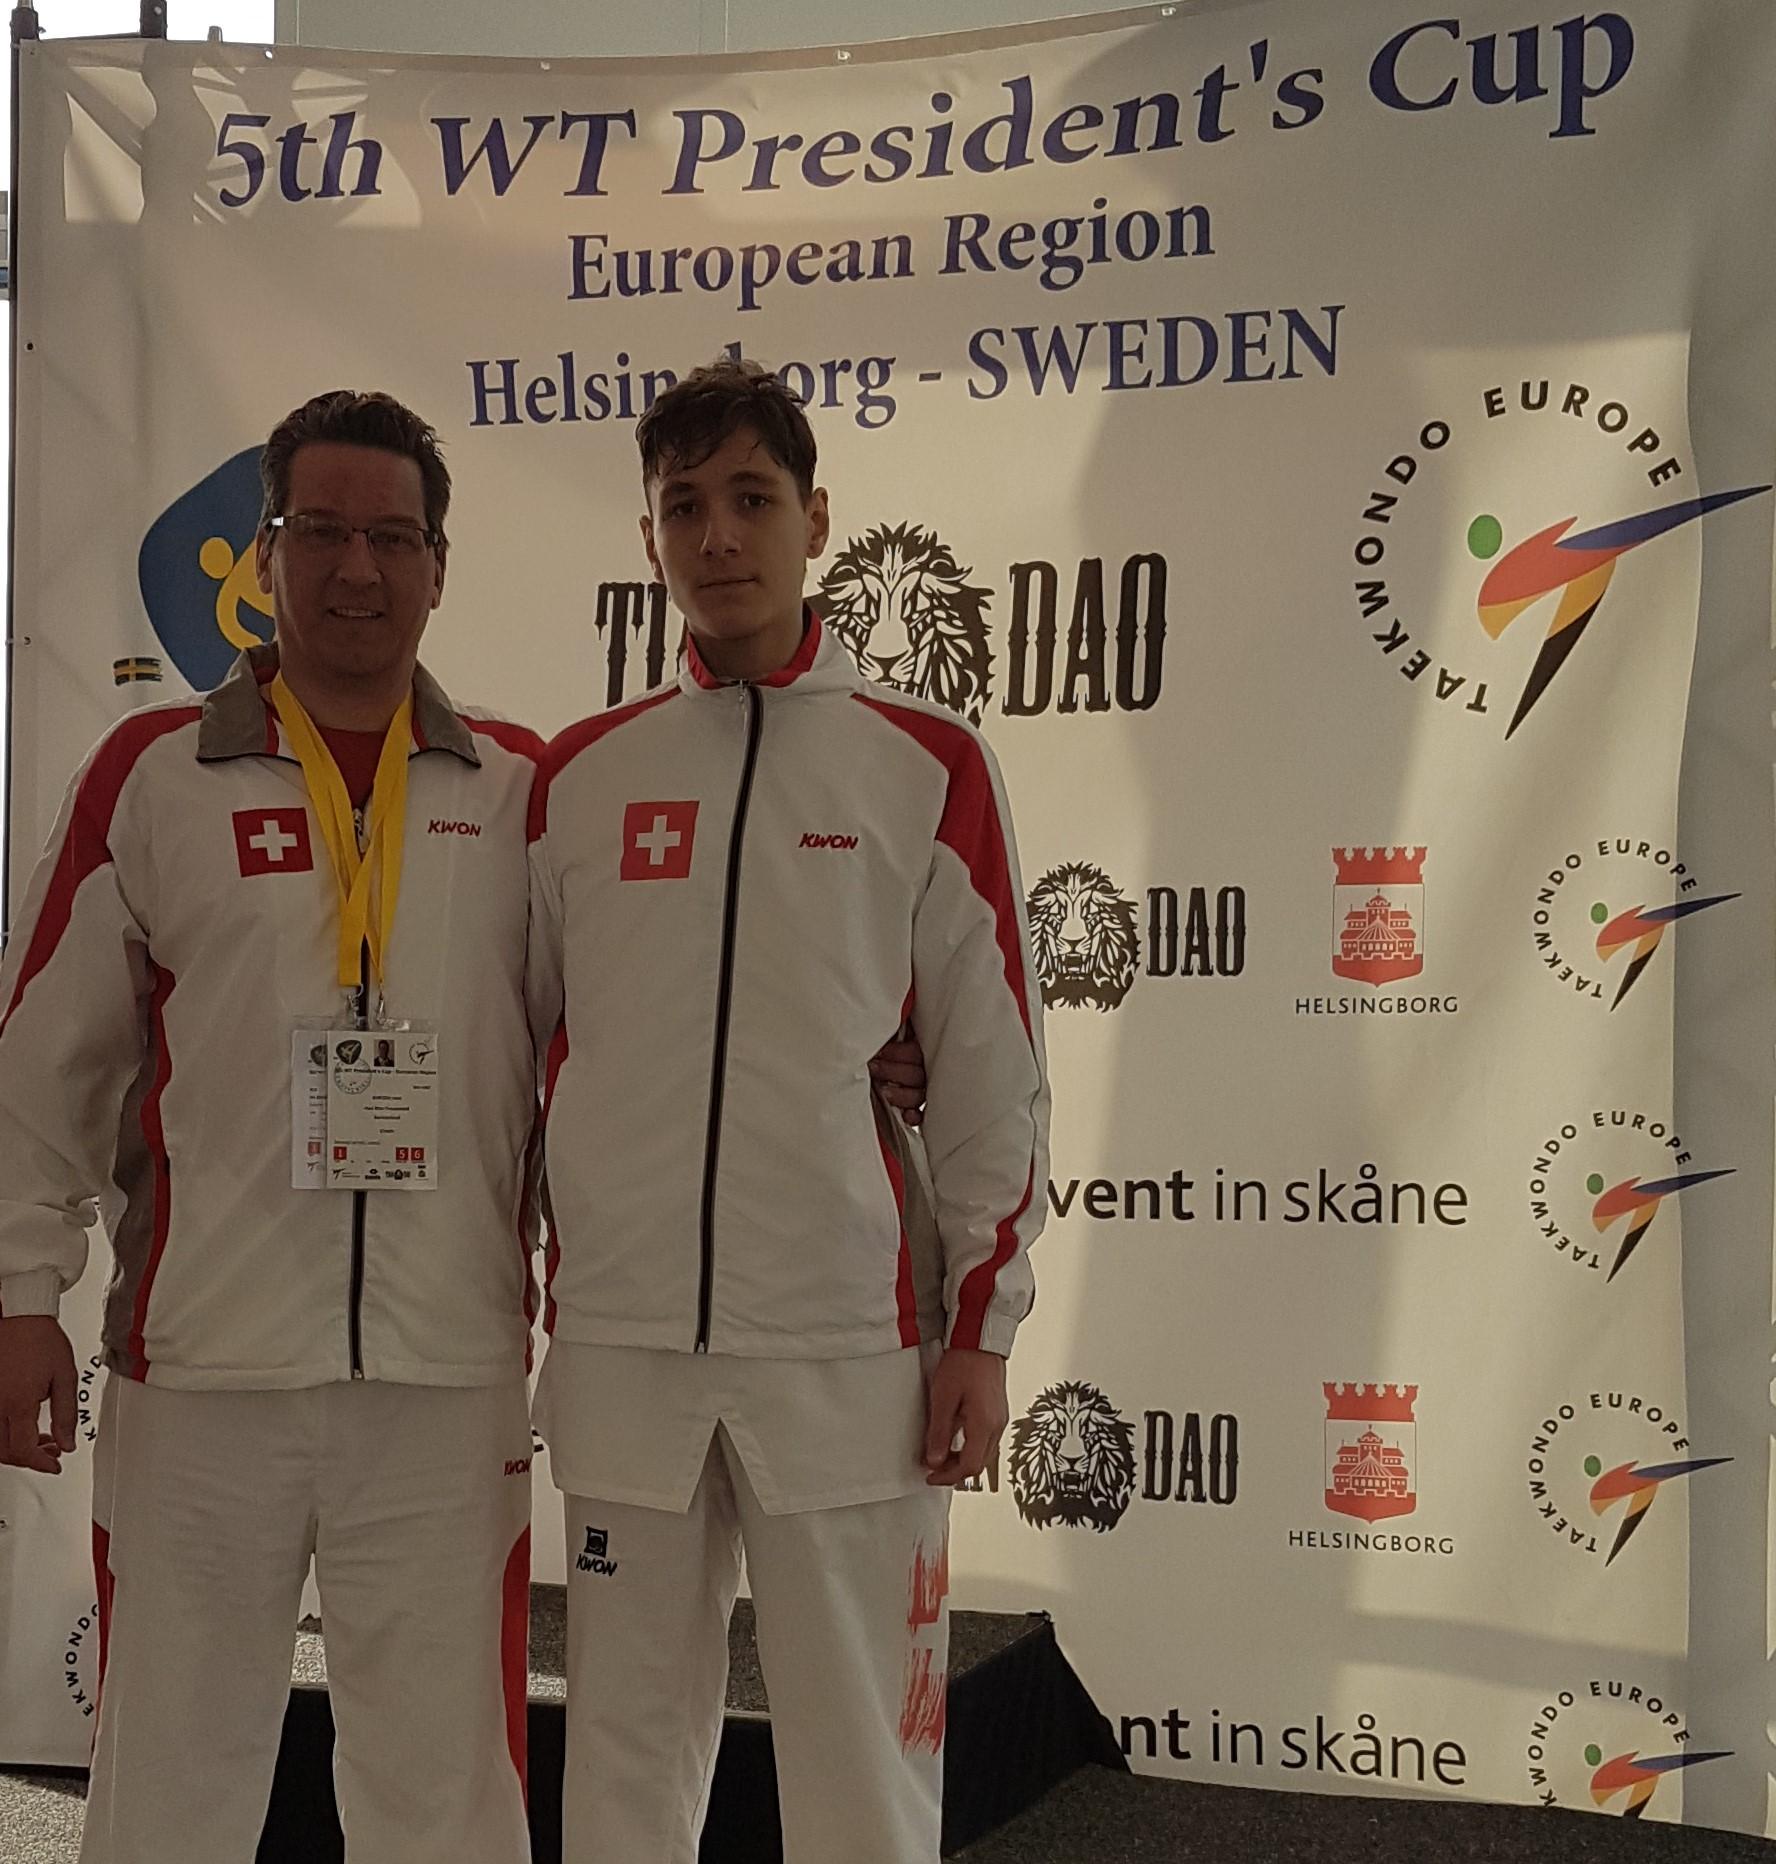 RLZO Frauenfeld am 5. Presidents Cup  in Helsingborg